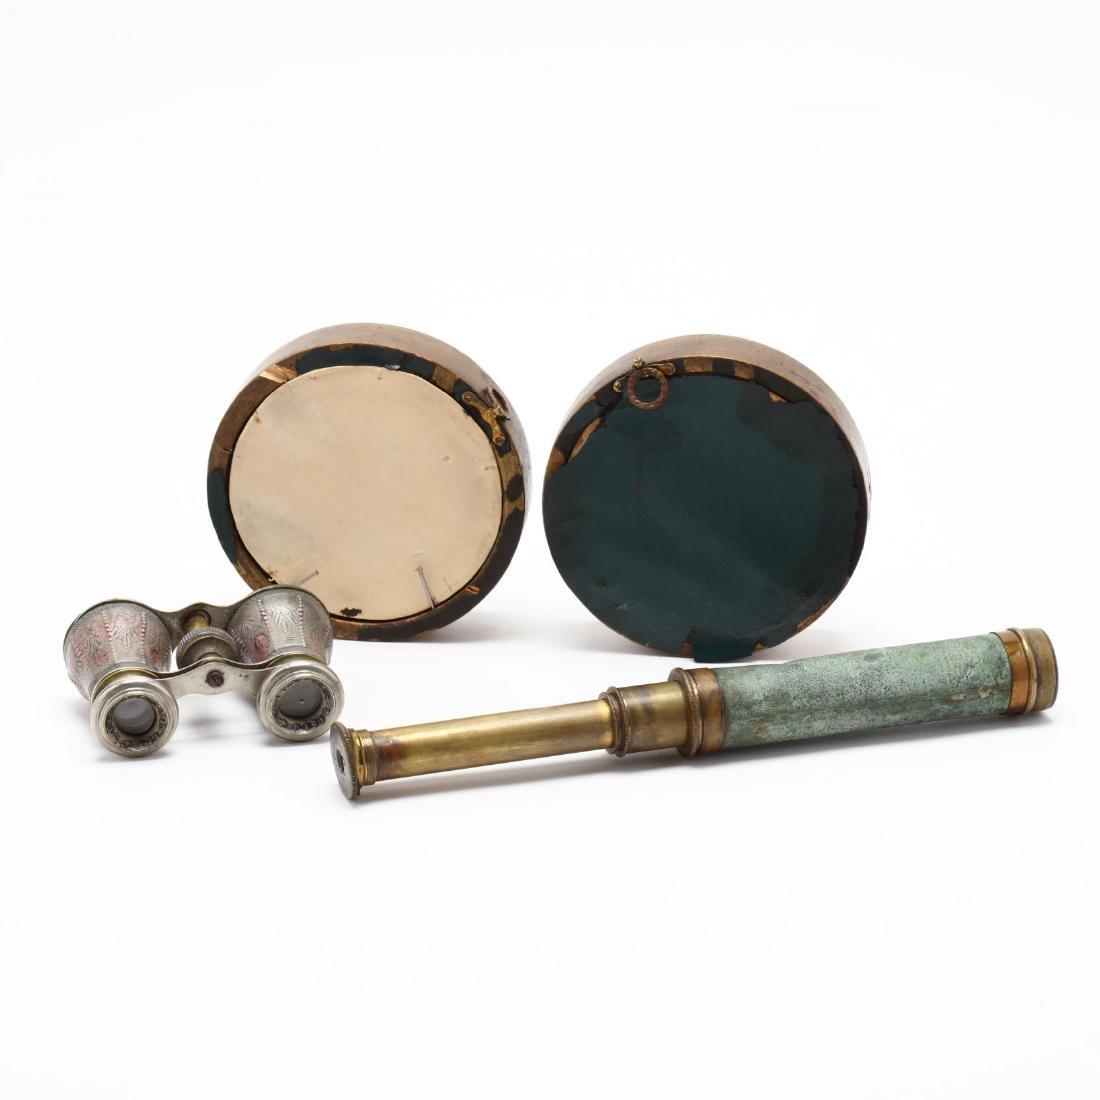 Antique Opera Glasses, Telescope and Plaques - 3